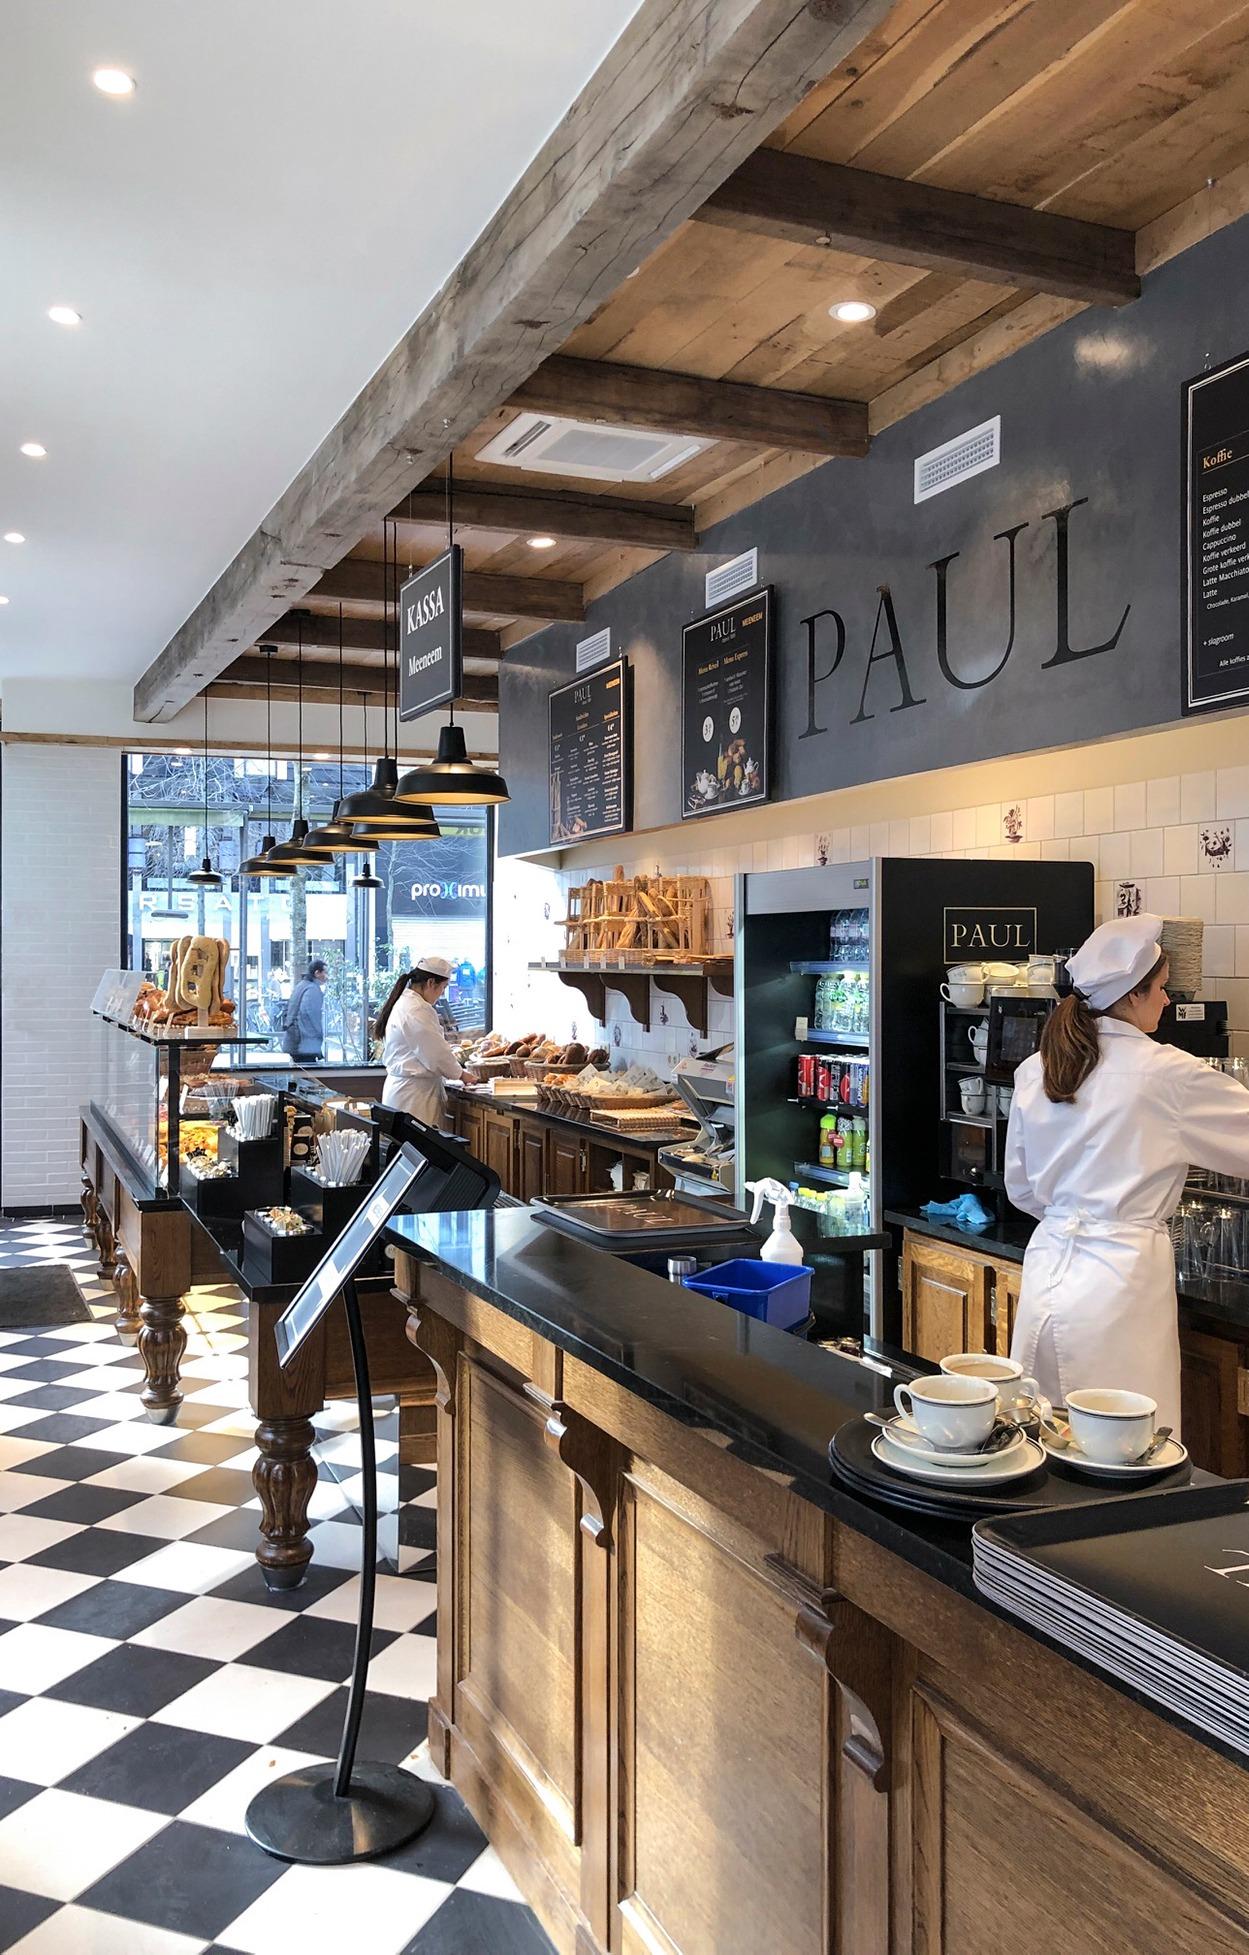 Boulangerie Paul Antwerp